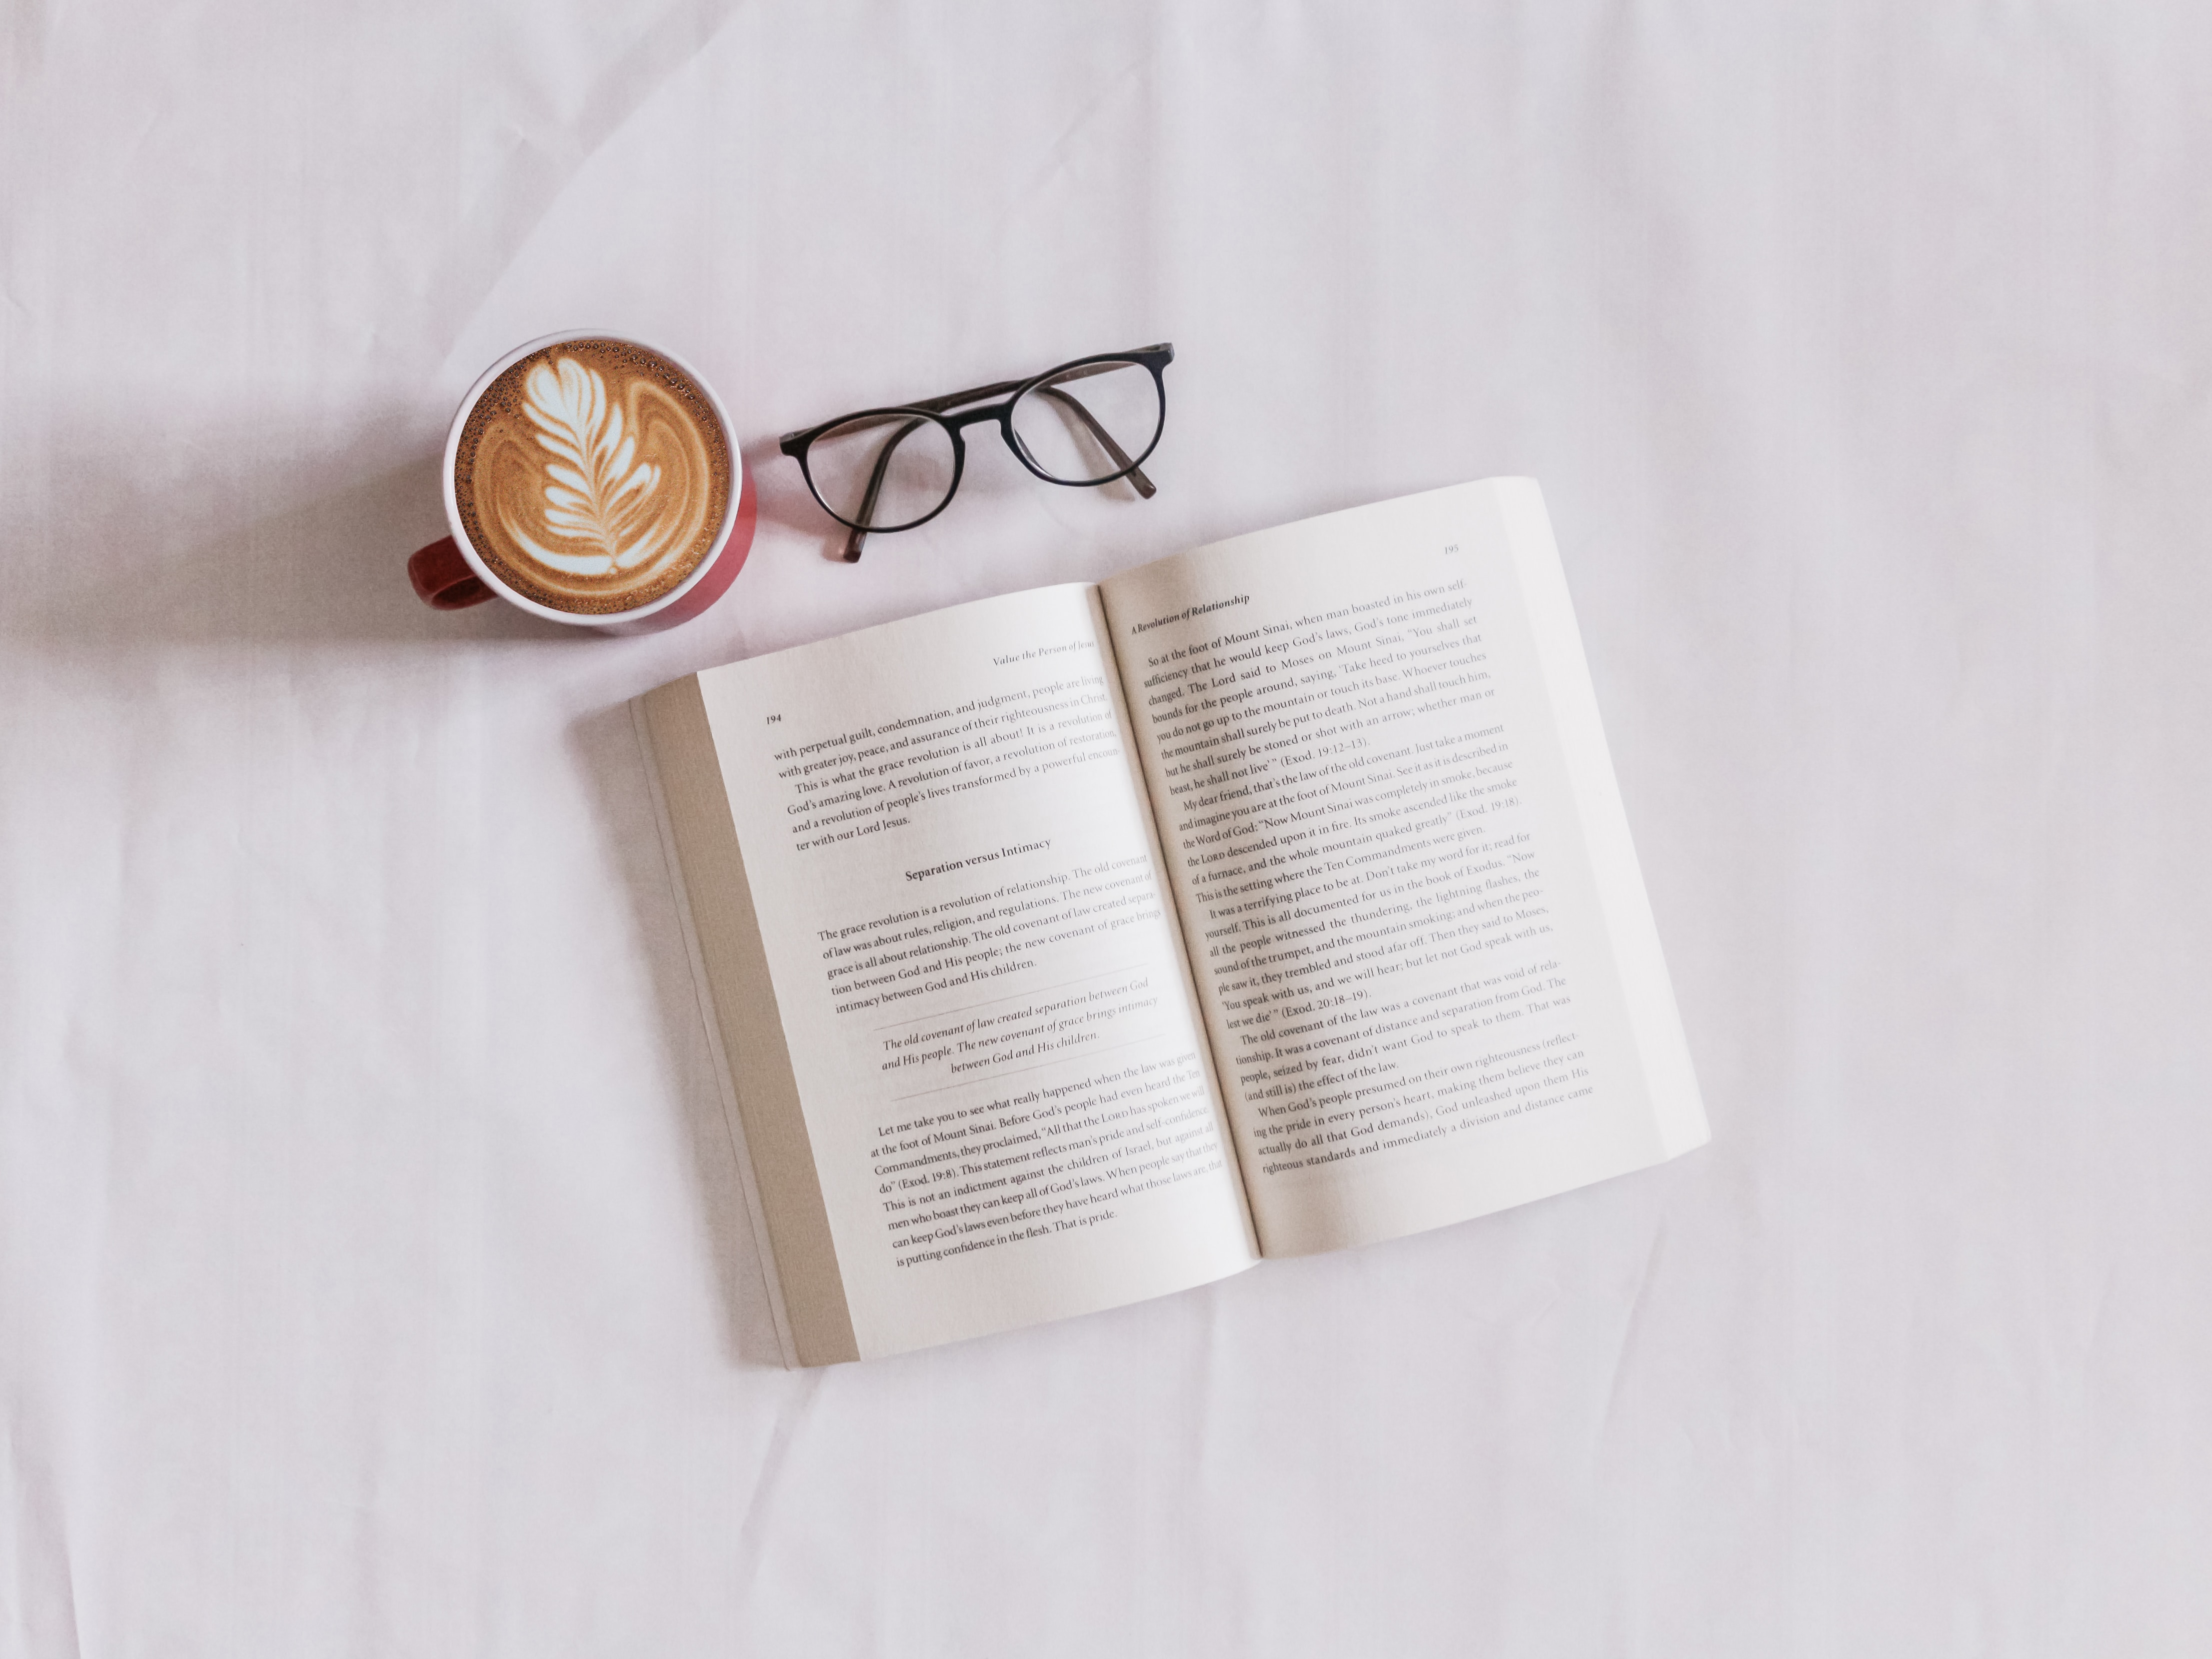 diseño libros lectura